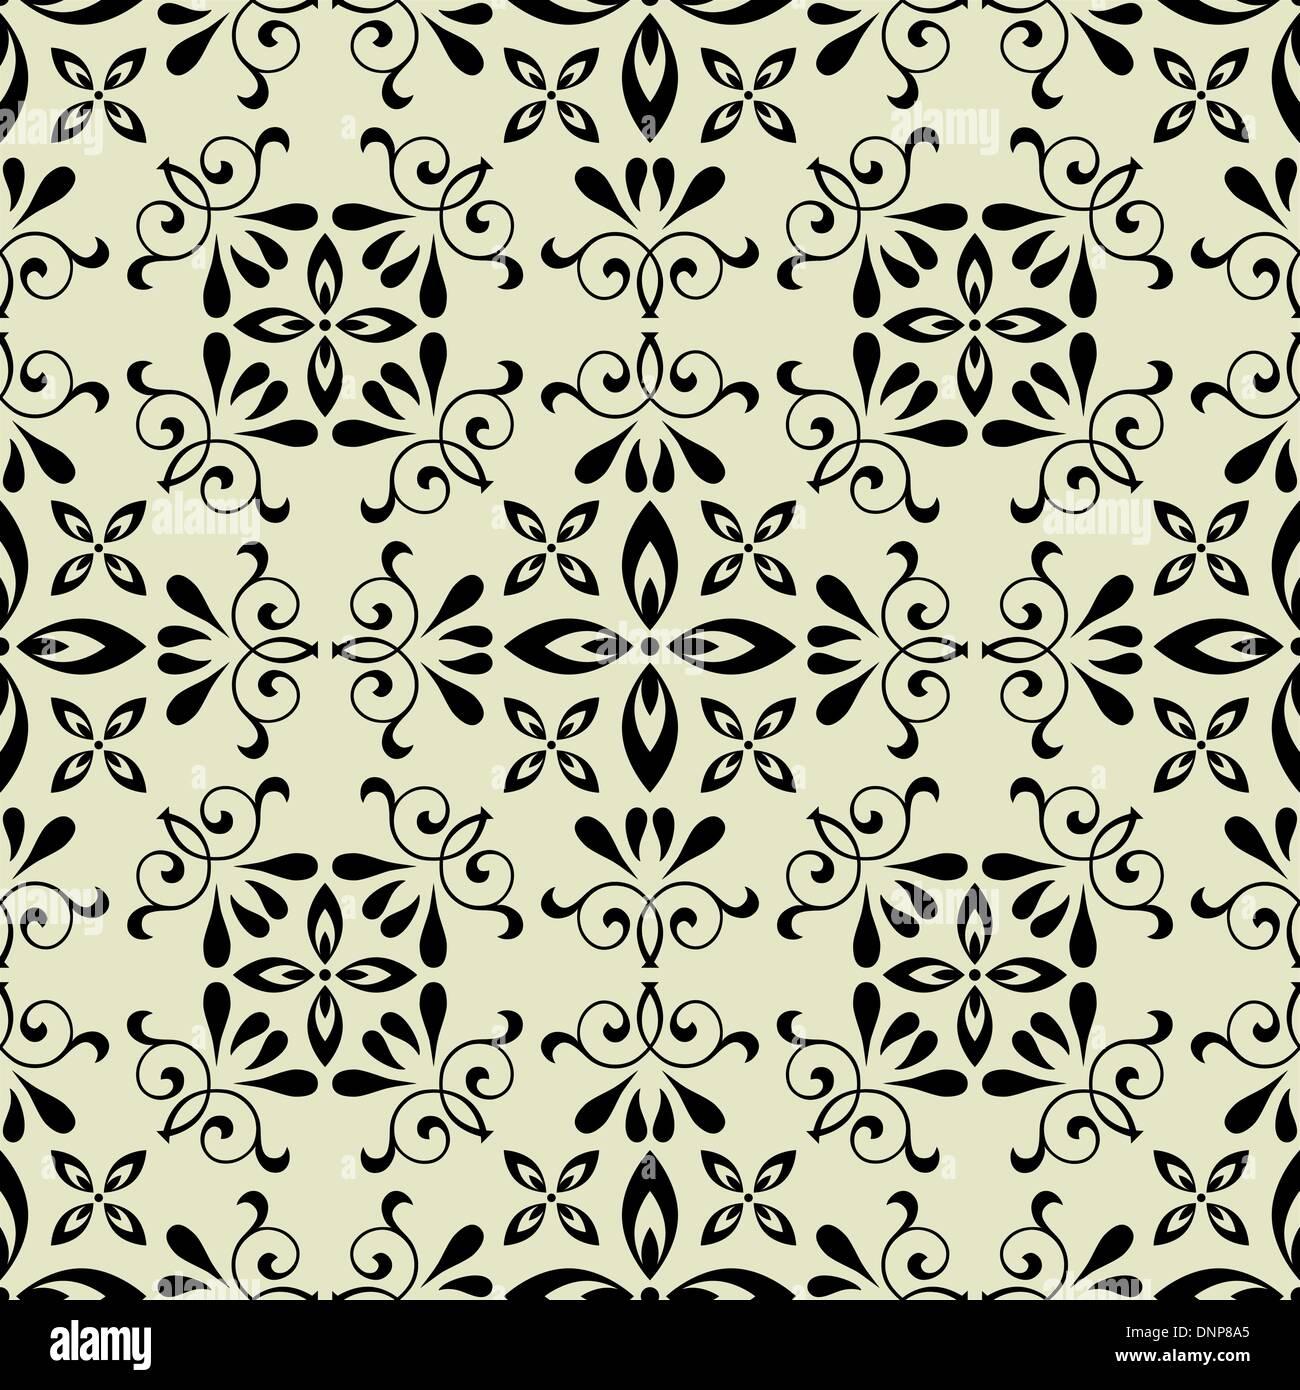 art vector seamless vintage pattern background - Stock Image